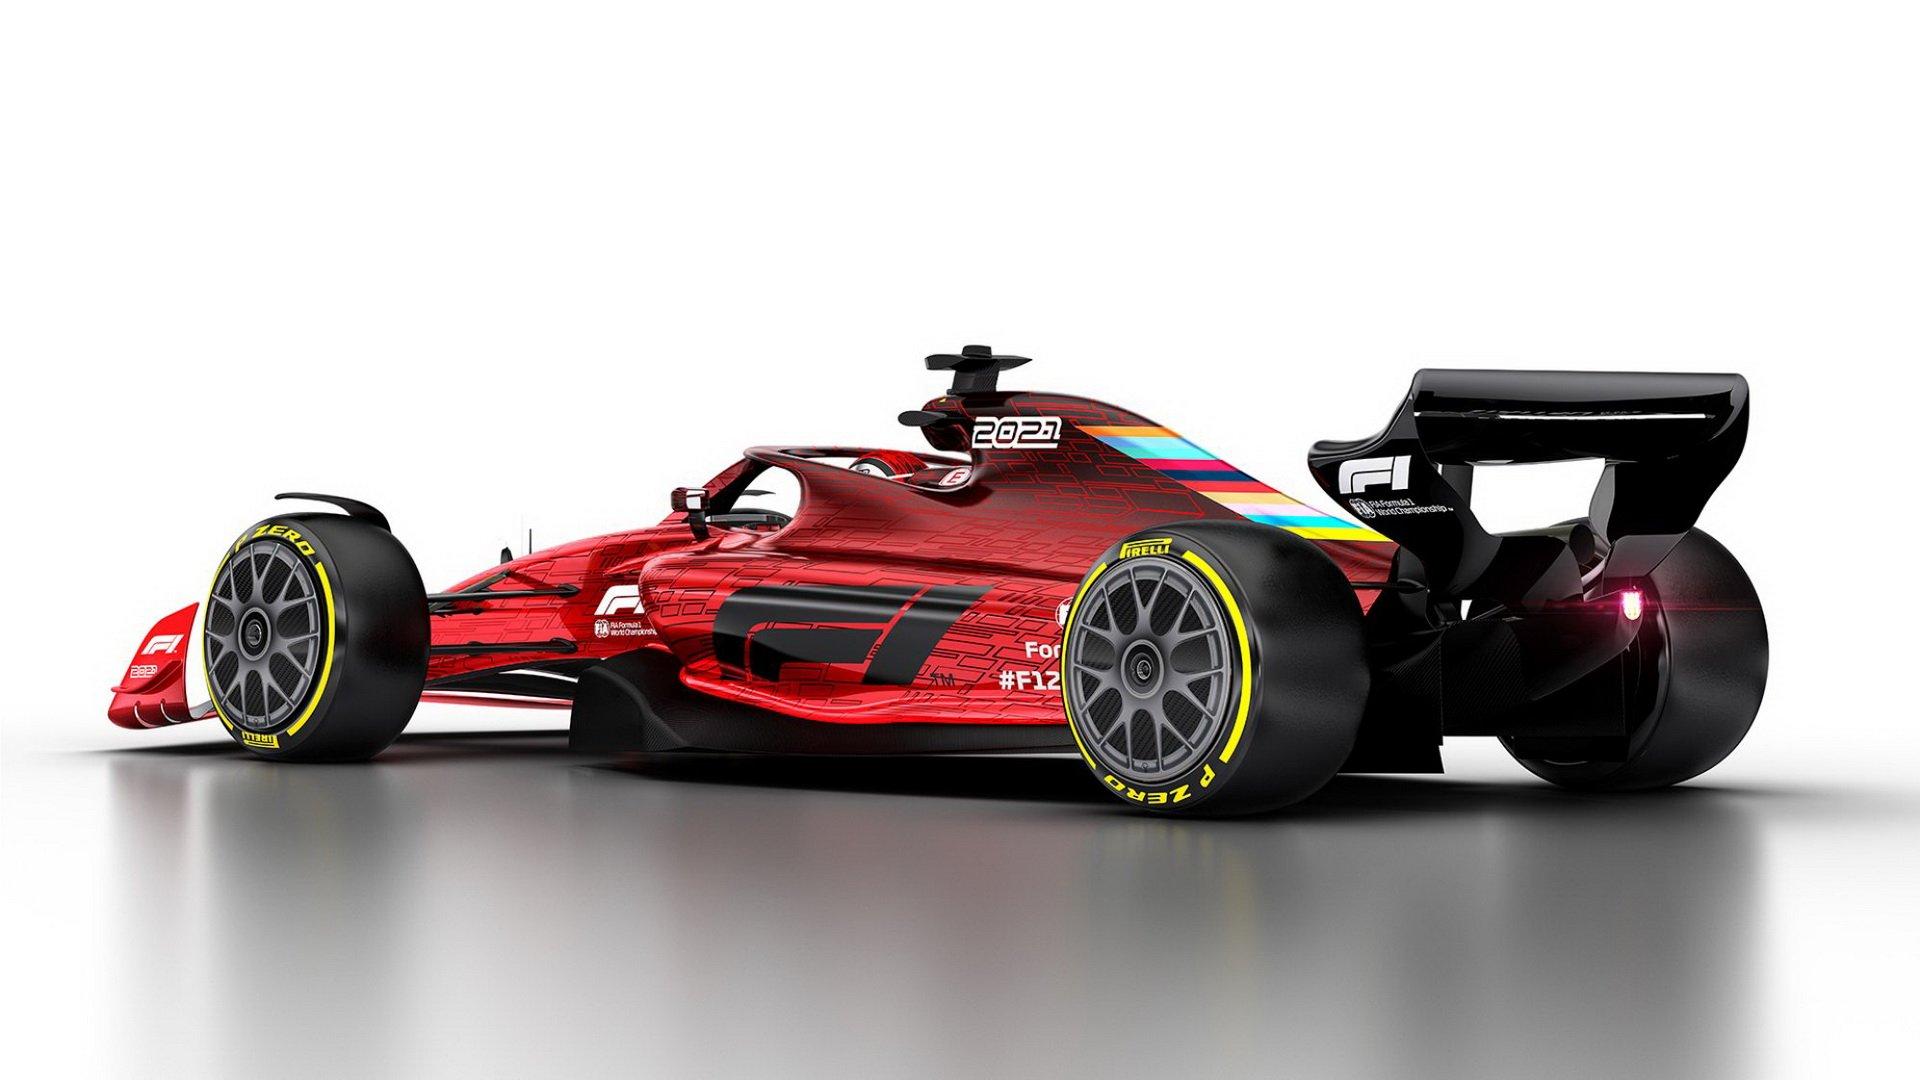 Formula-1-2021-cars-8